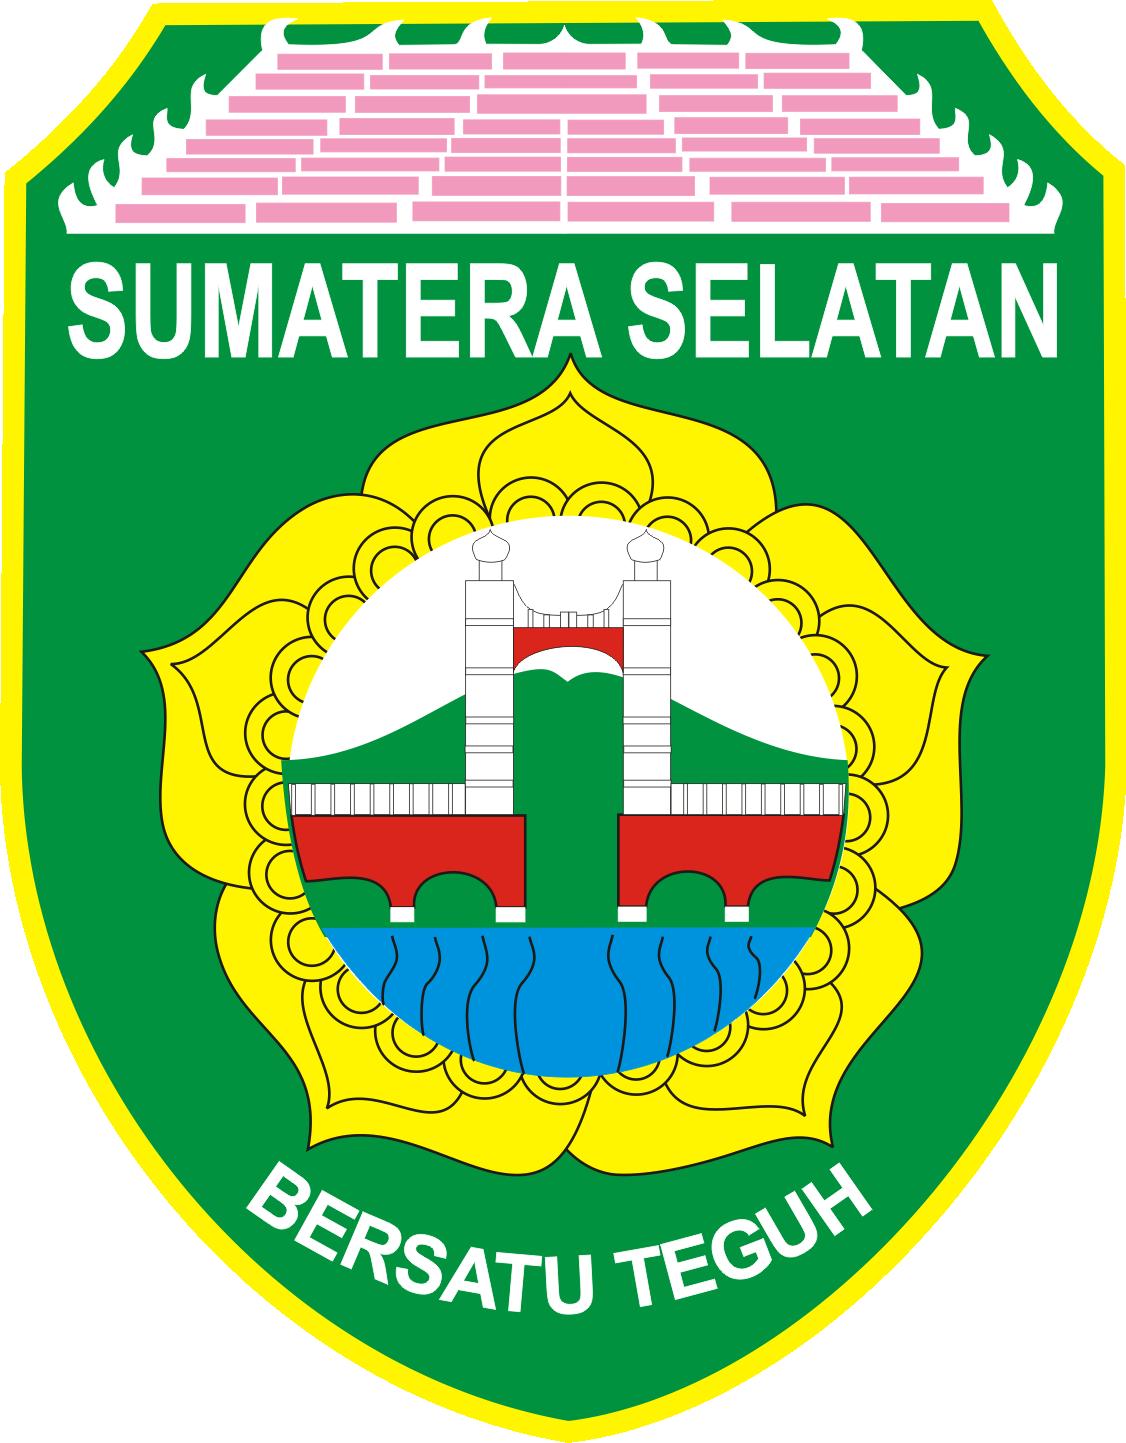 6 Sumatera Selatan Kota Indonesia